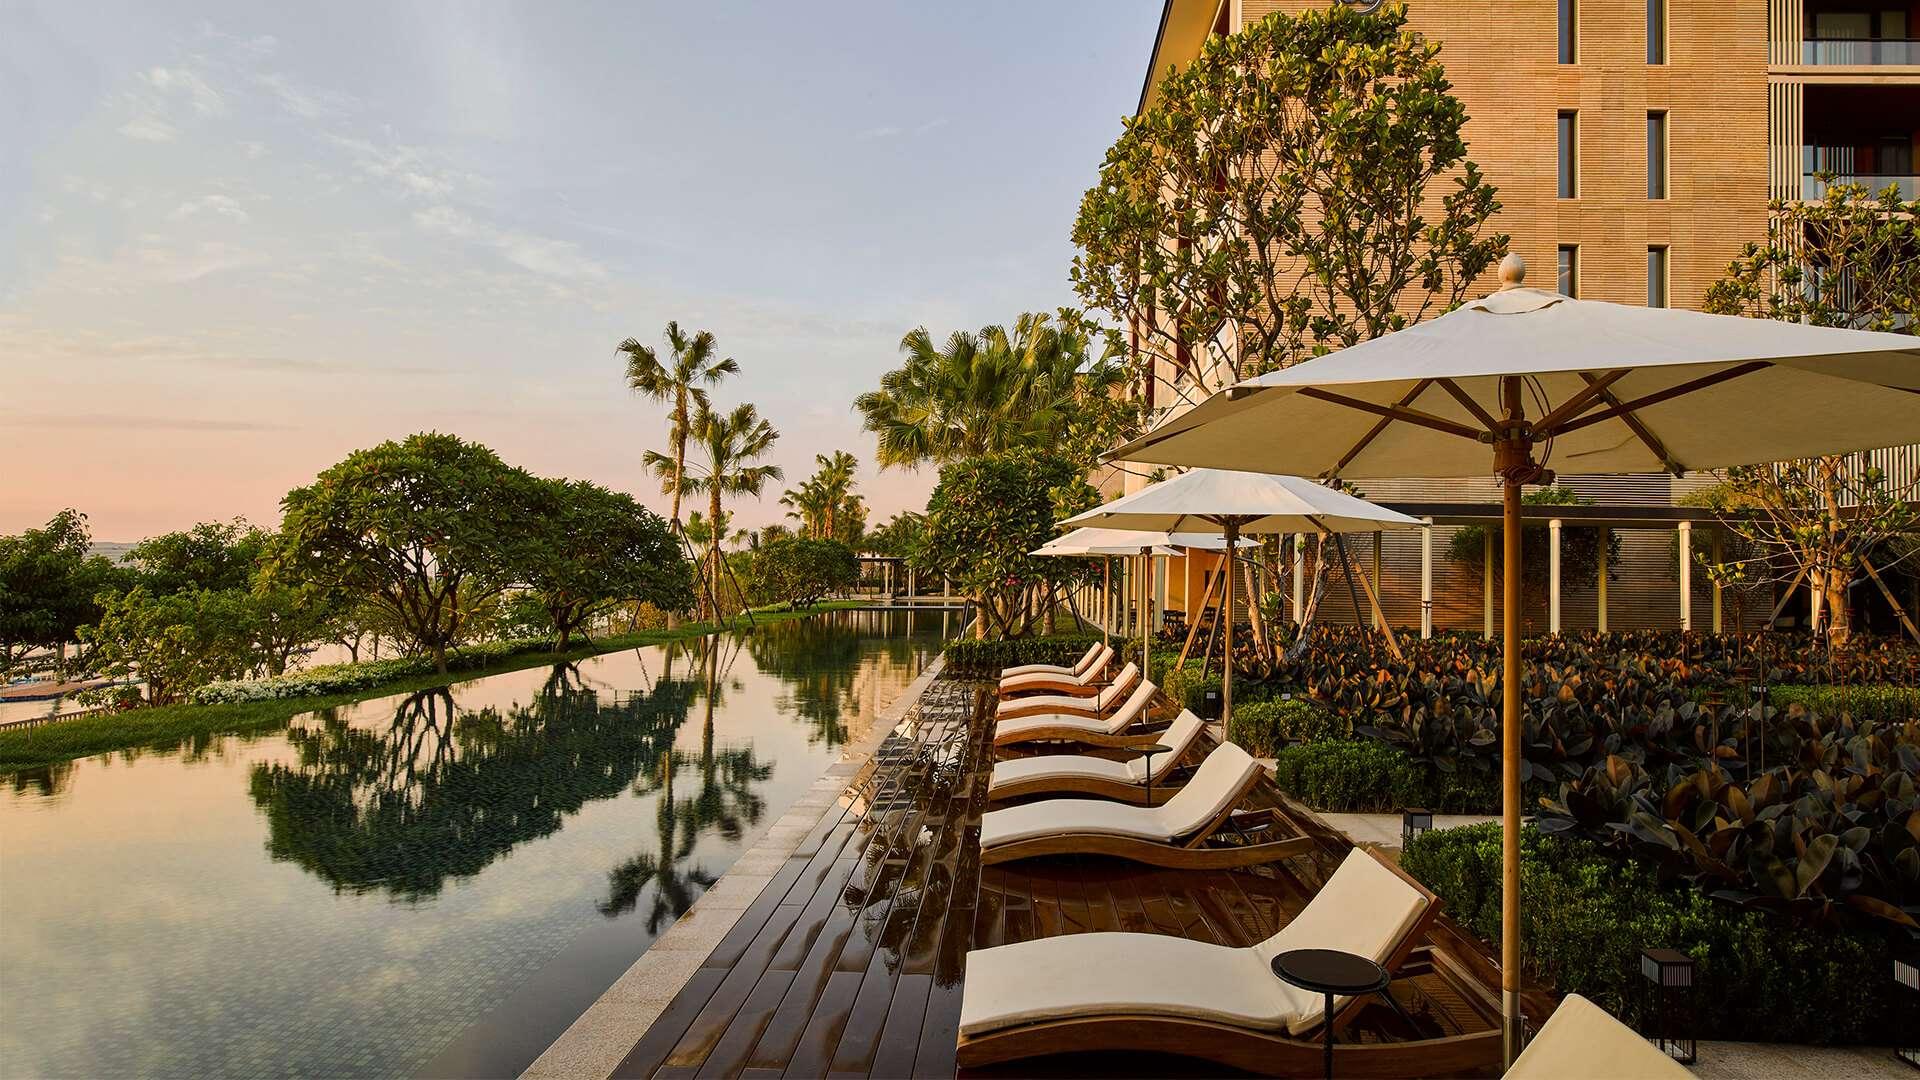 The Pushang Gallery Xiamen Urban Resort Concepts Outdoor Restaurant Spa Rooms Hotel